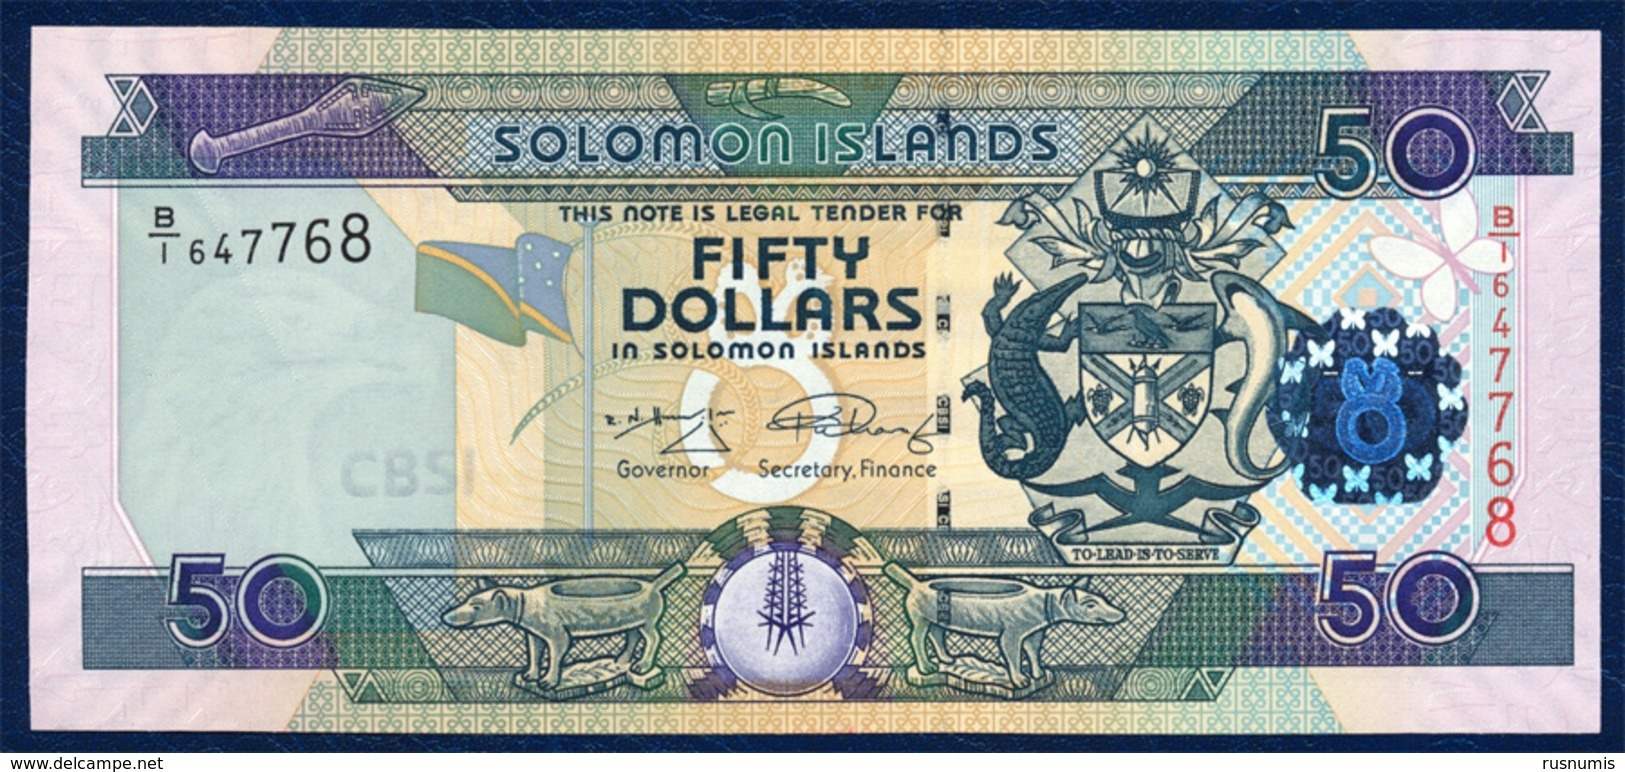 SOLOMON ISLANDS 50 DOLLARS P-29b LIZARD 2009 UNC - Salomons